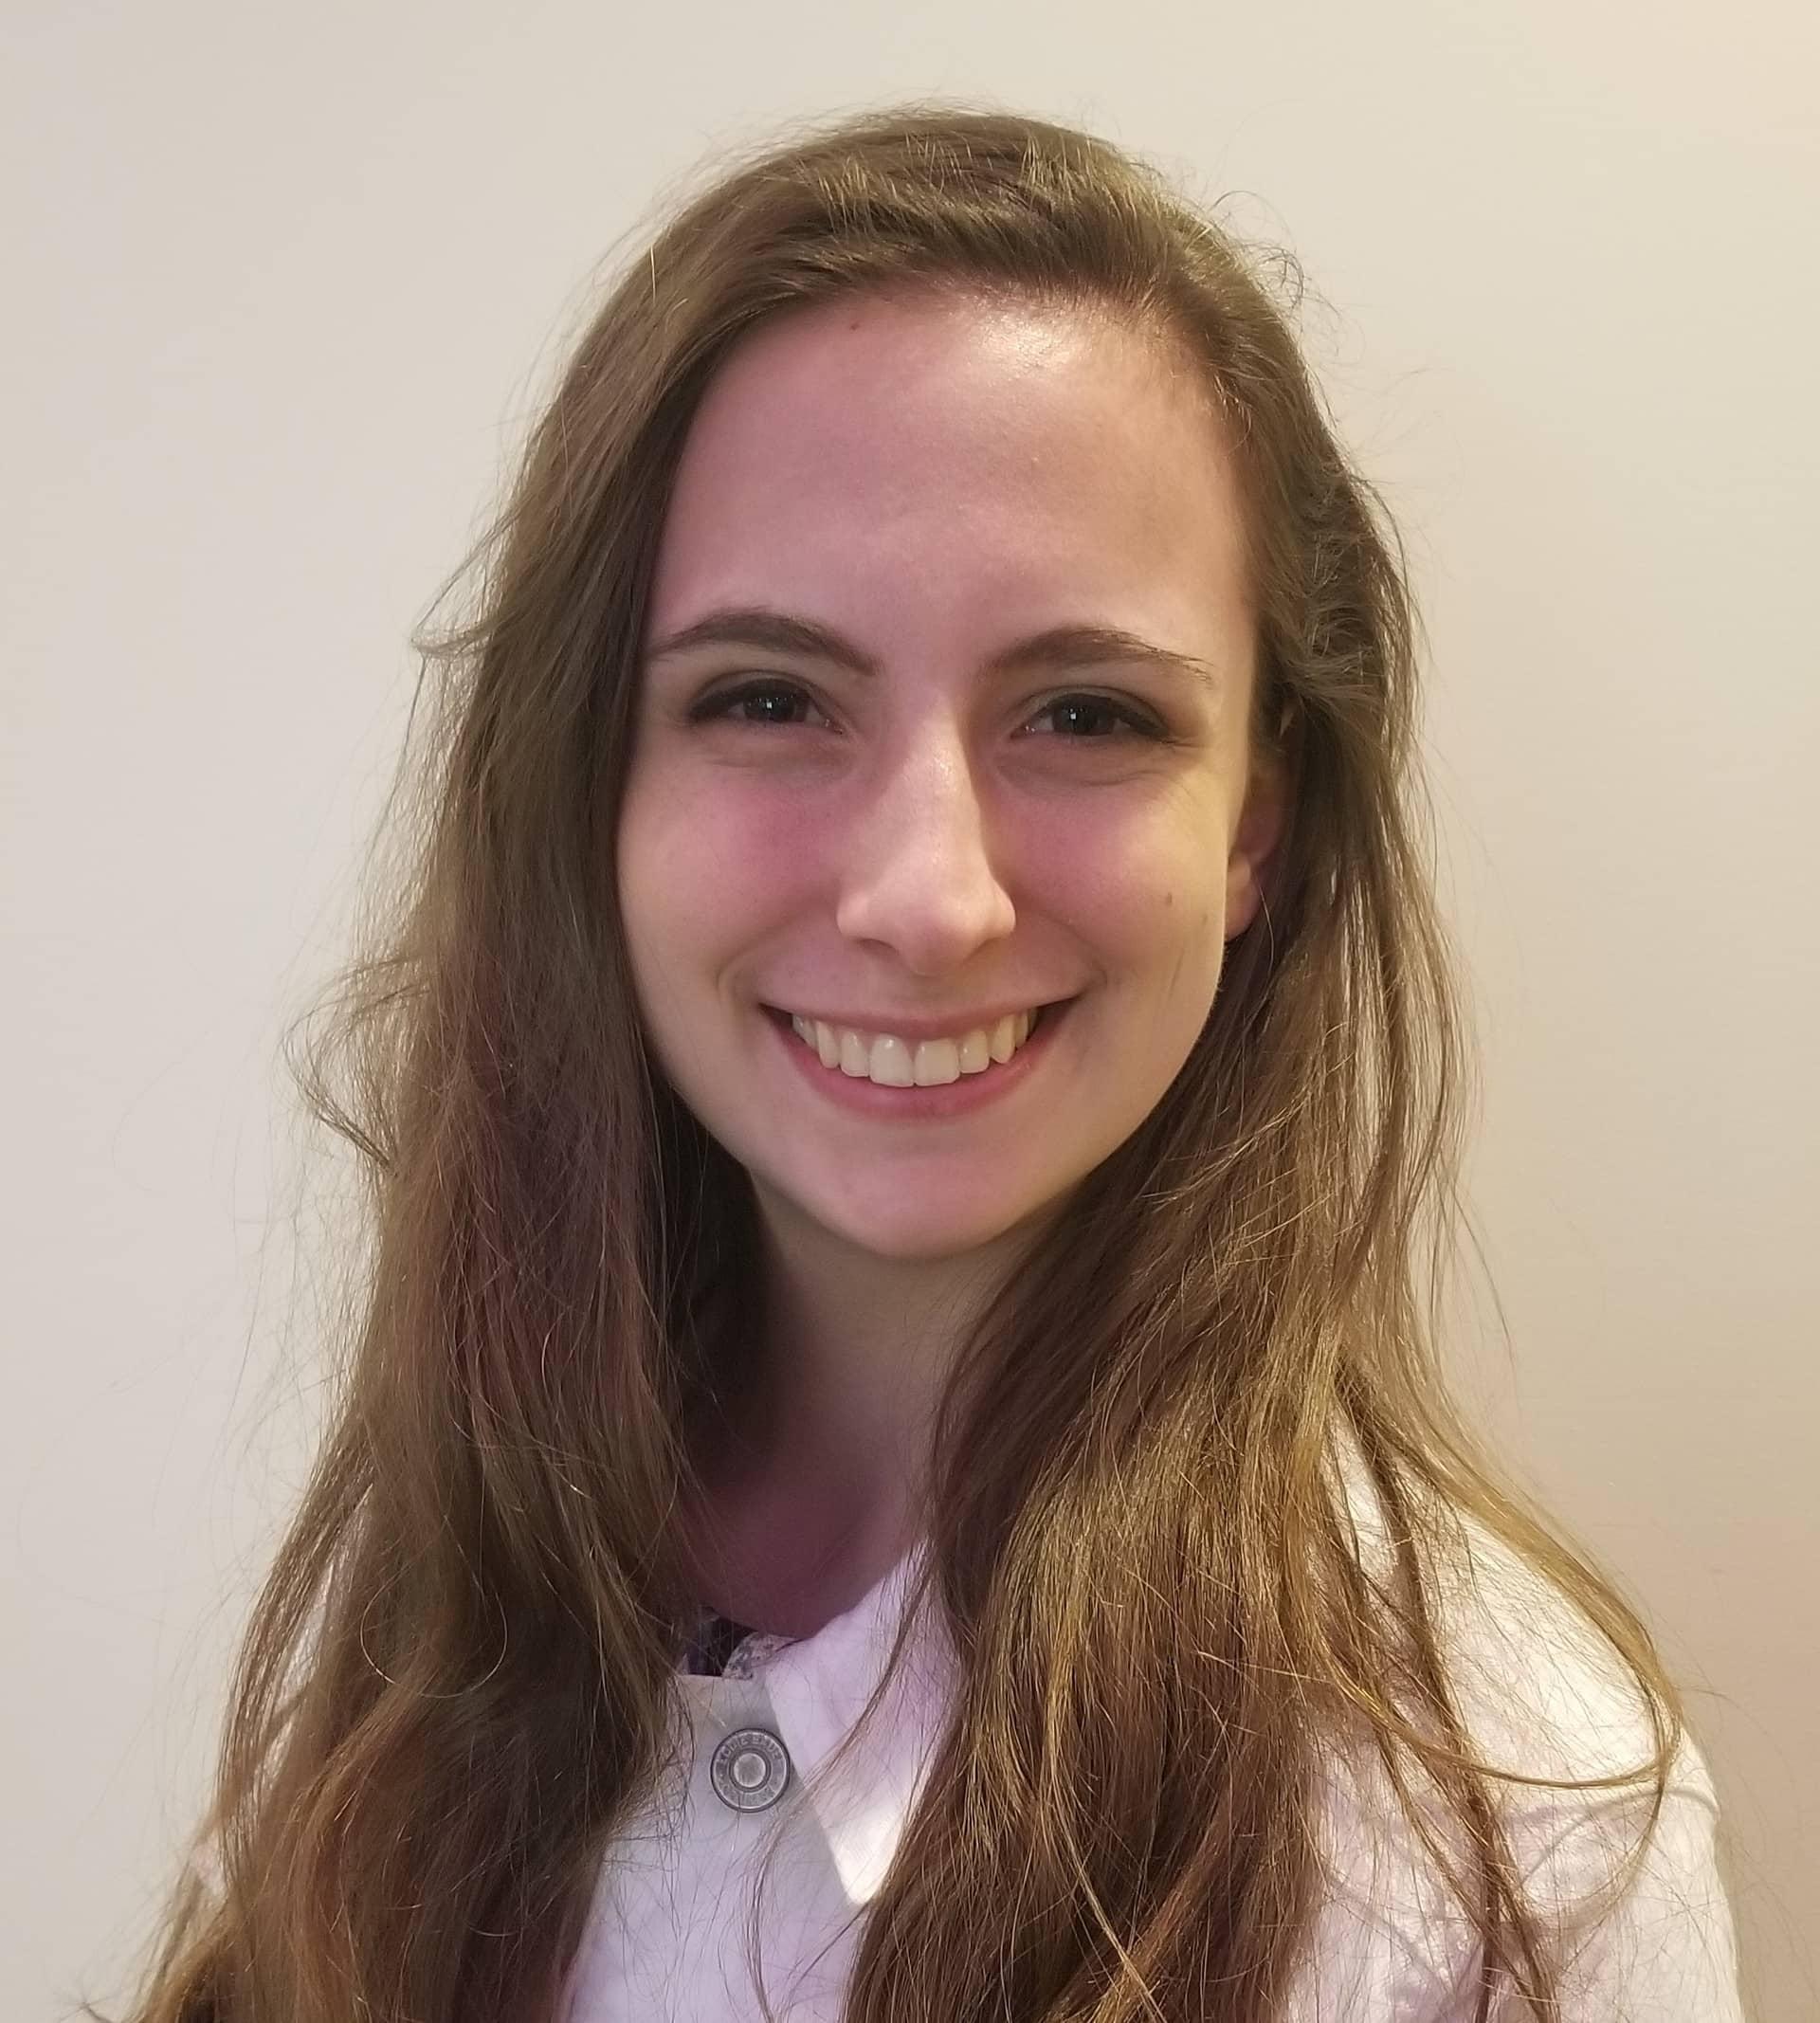 Chloe Quigley